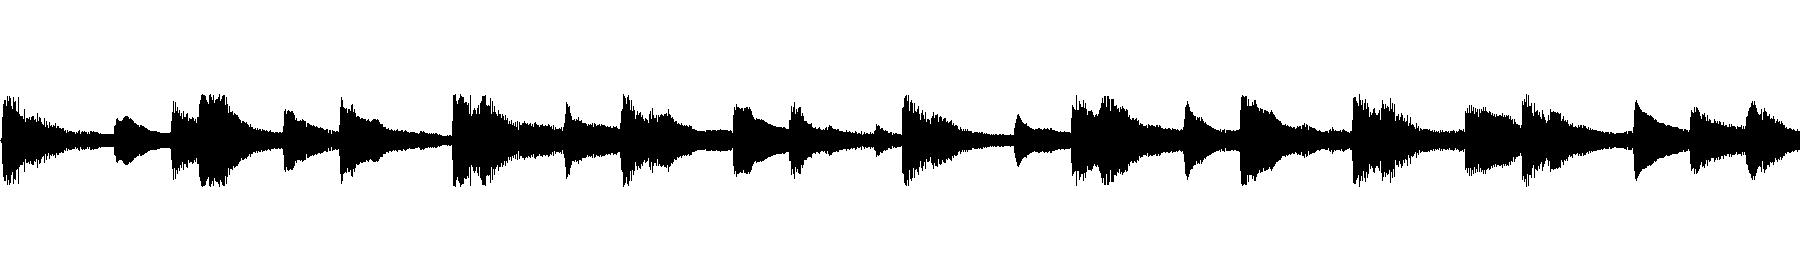 piano  guitar sample 121 g minor